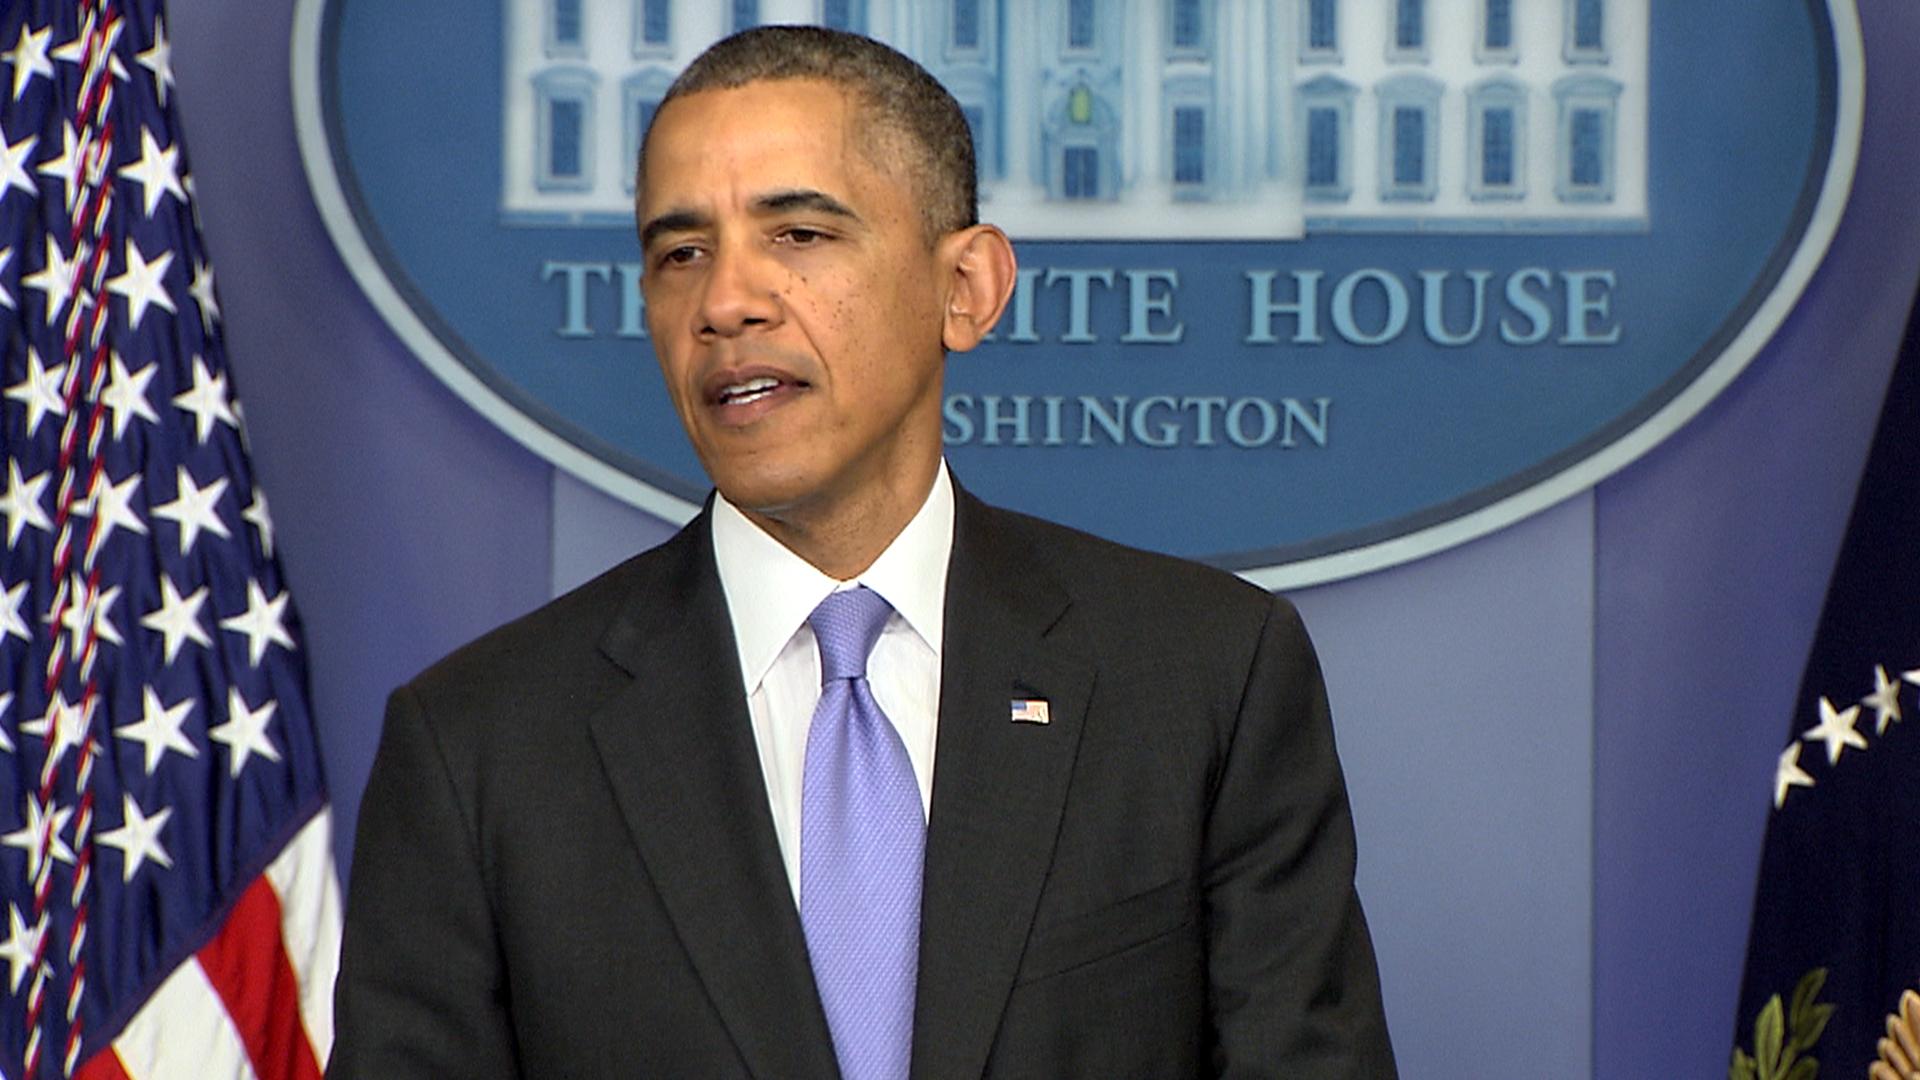 Obama on VA Misconduct: 'I Will Not Tolerate It'